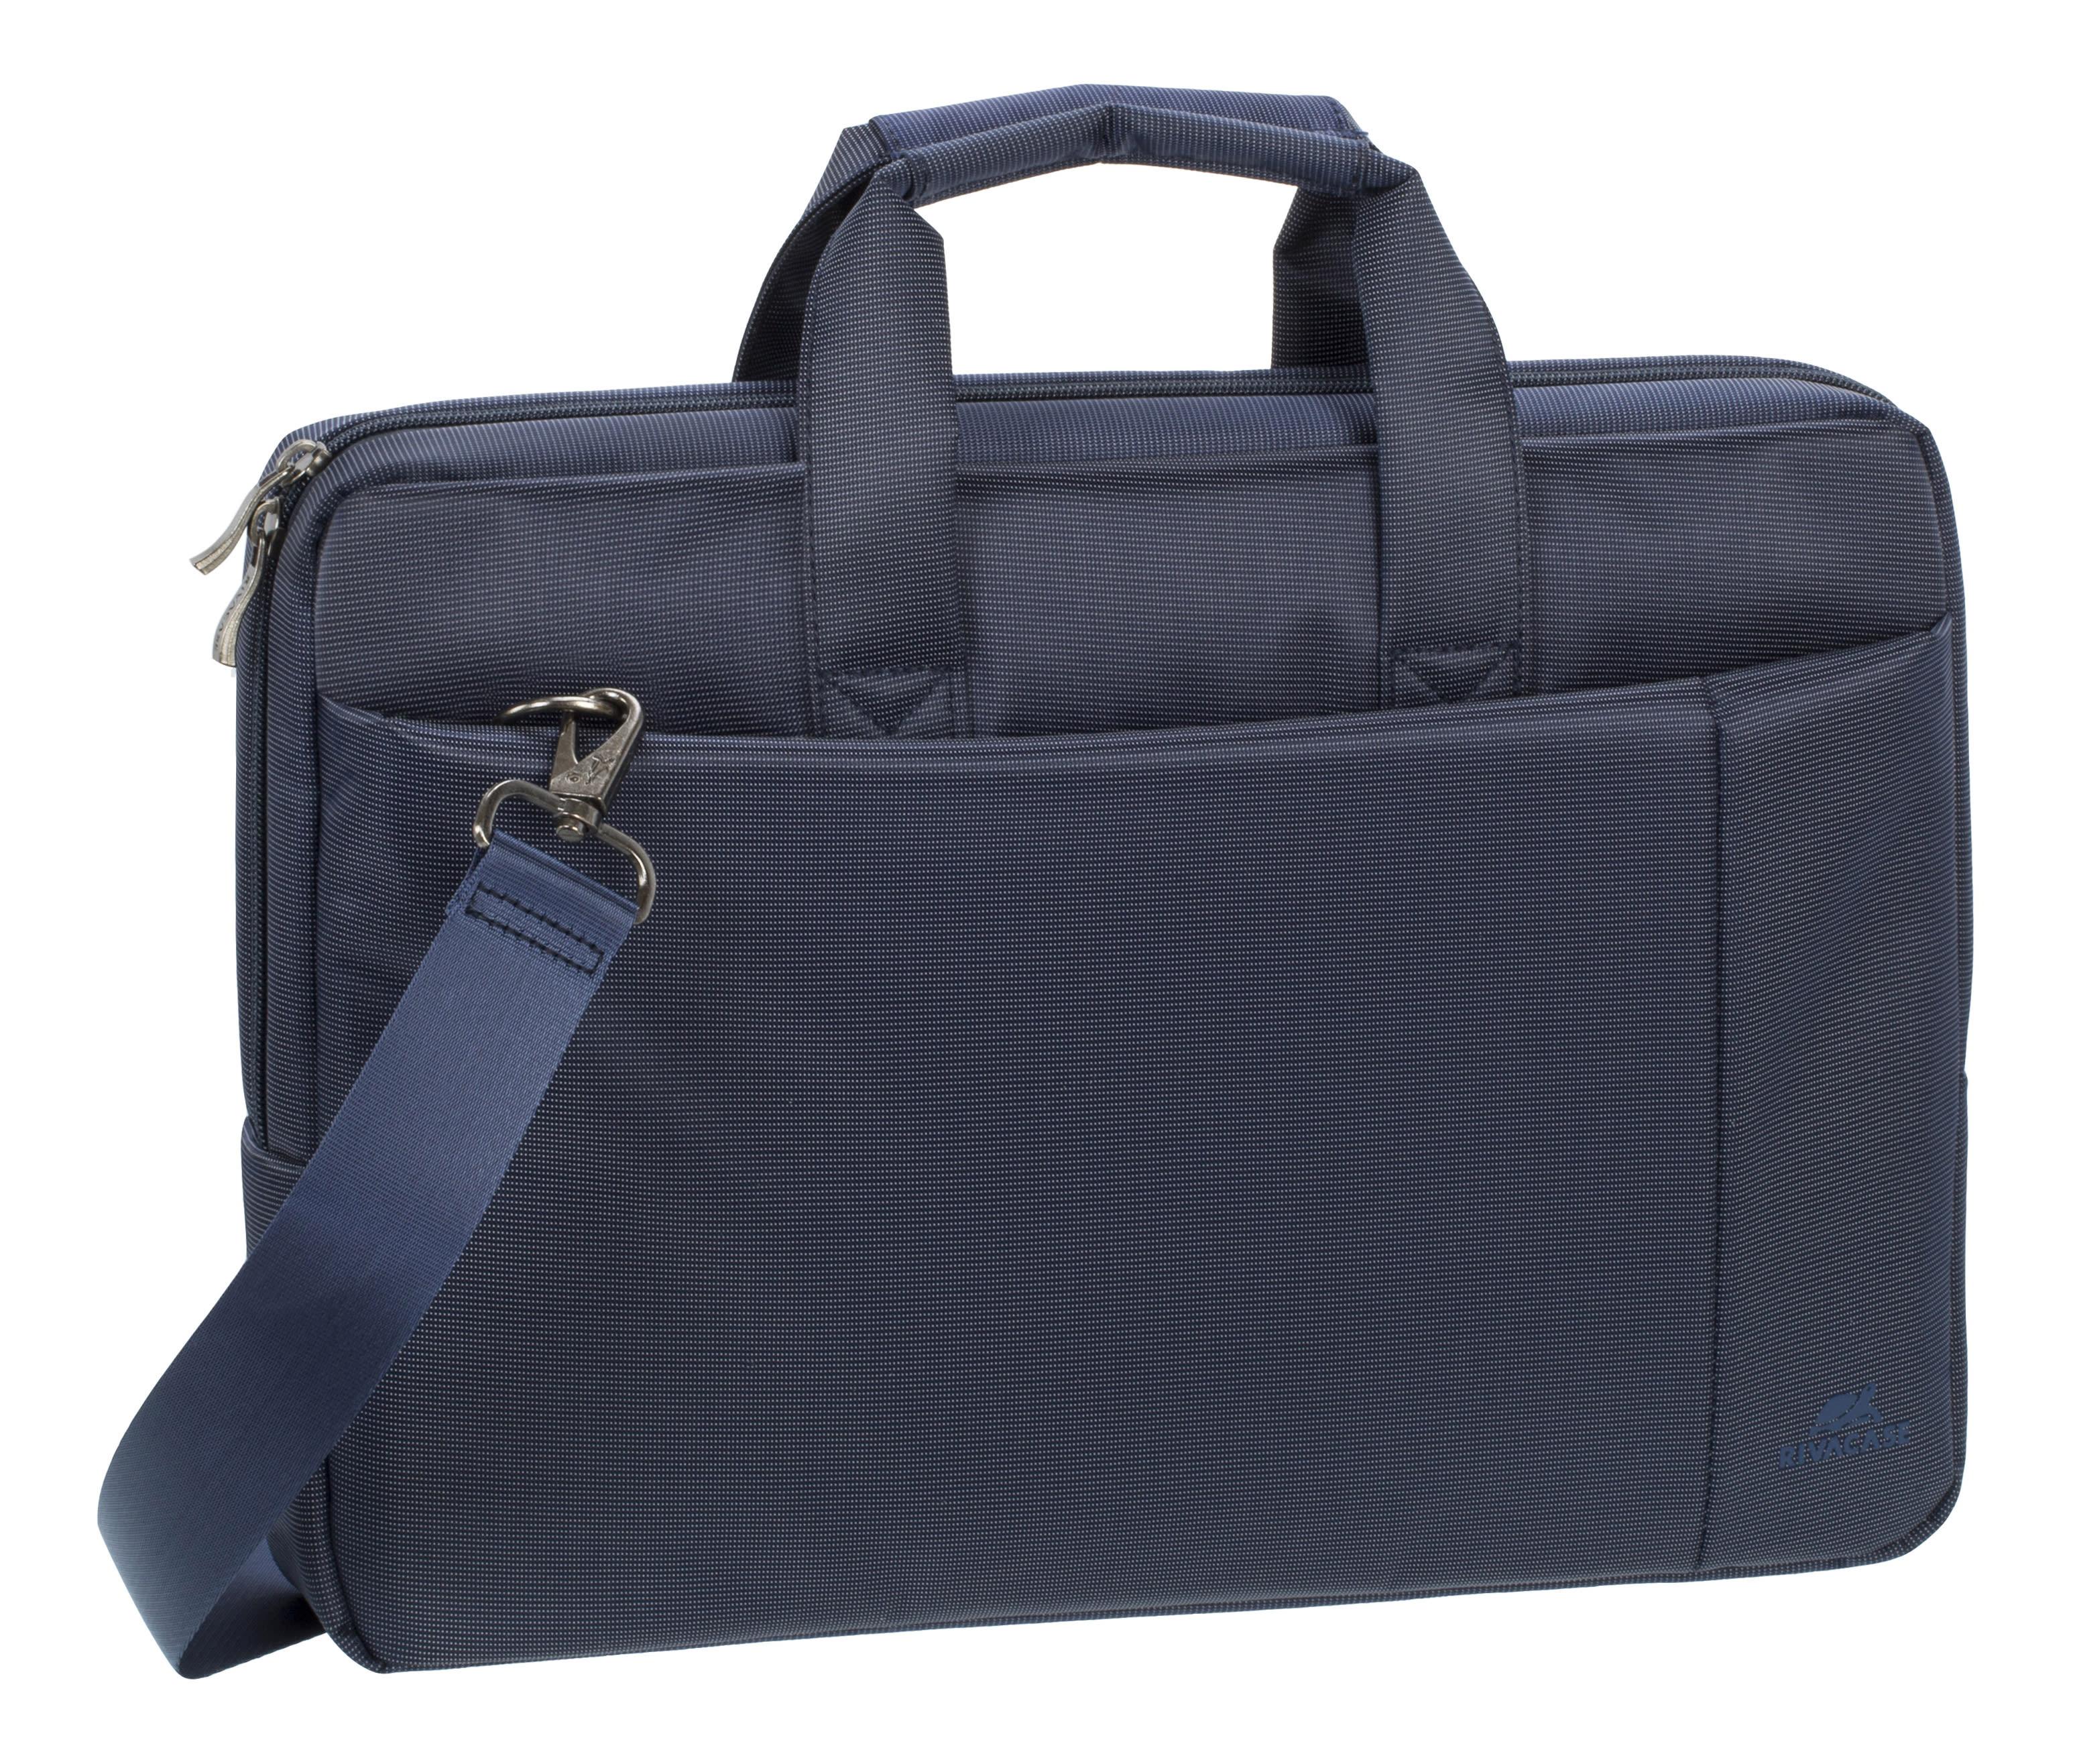 "Rivacase 8231 Laptop Bag With 15.6"" Laptop Pocket, Blue"